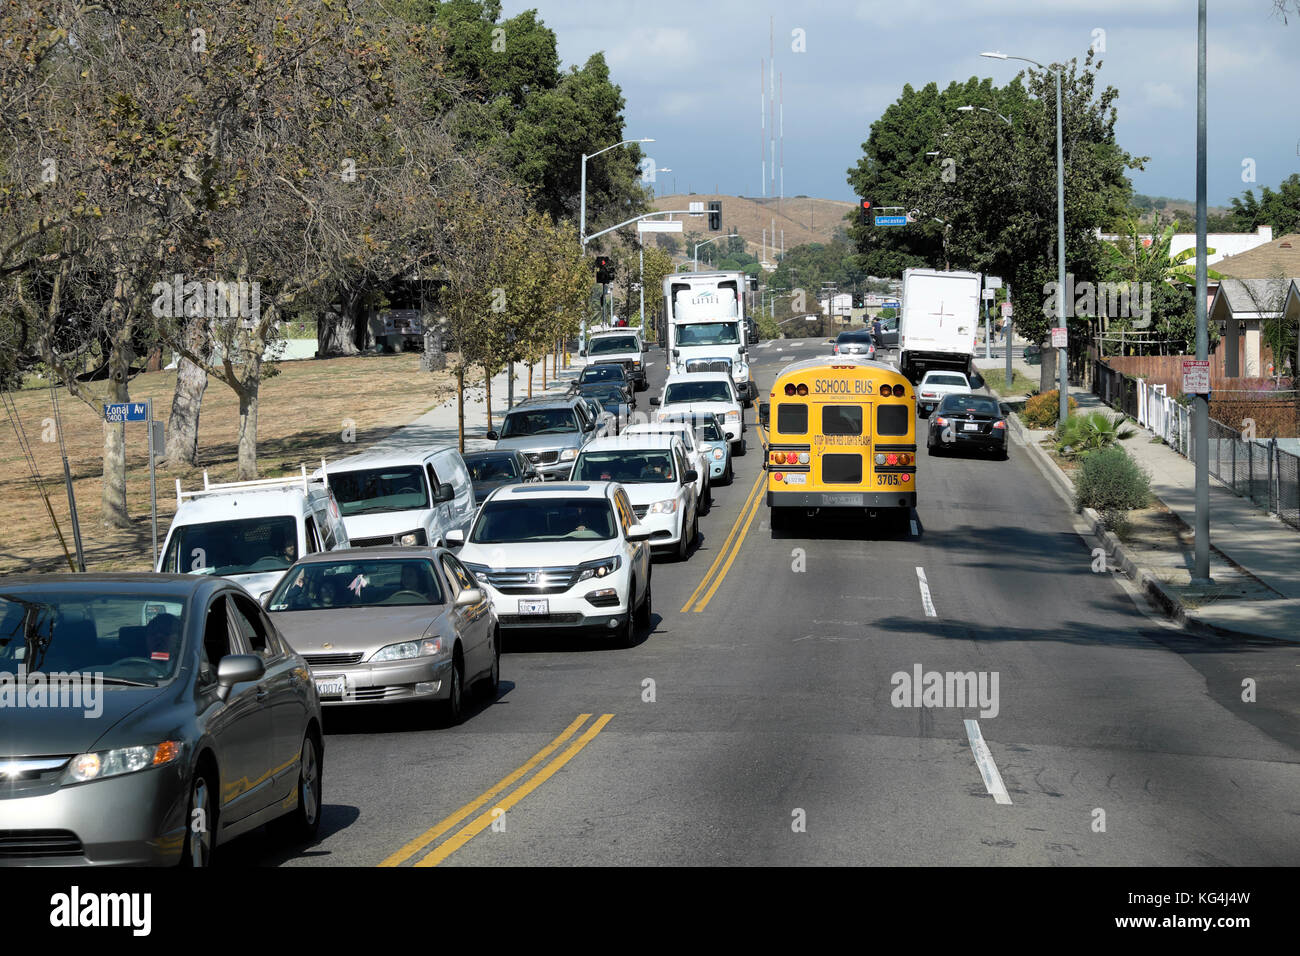 Street scene in Highland Park, Los Angeles, California  USA   KATHY DEWITT - Stock Image